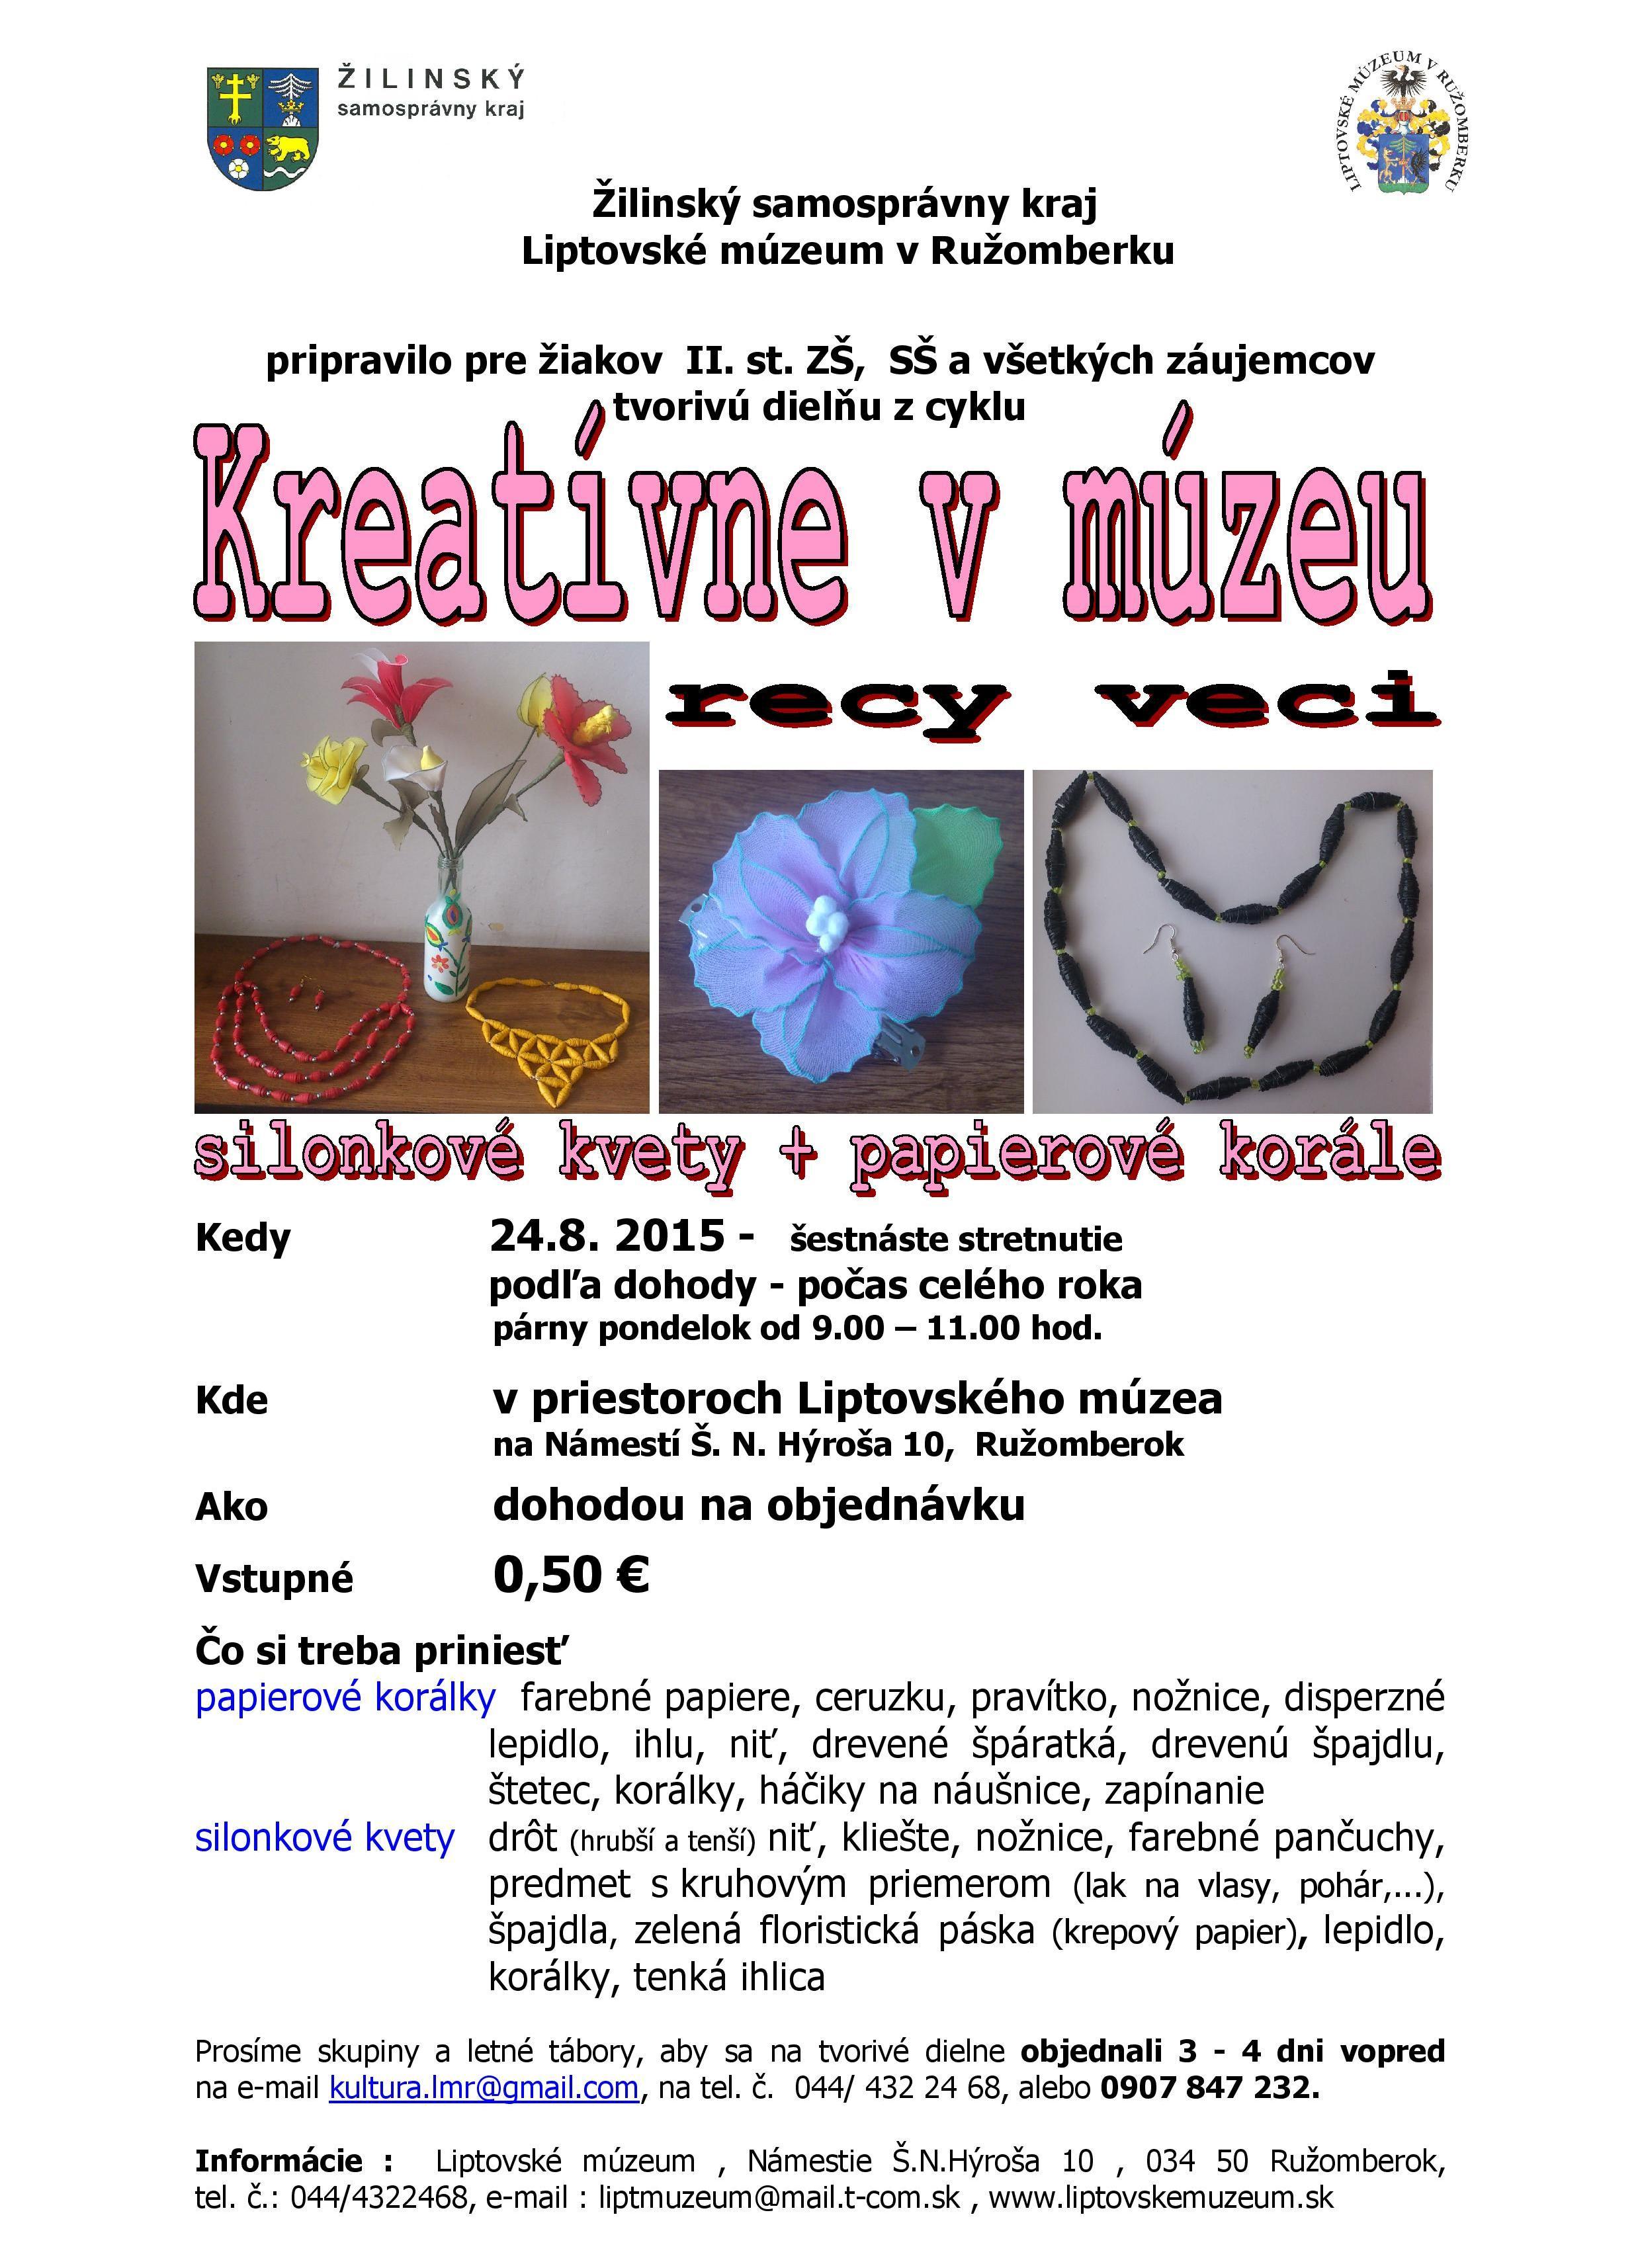 kvm-silonkove-kvety-august-2015